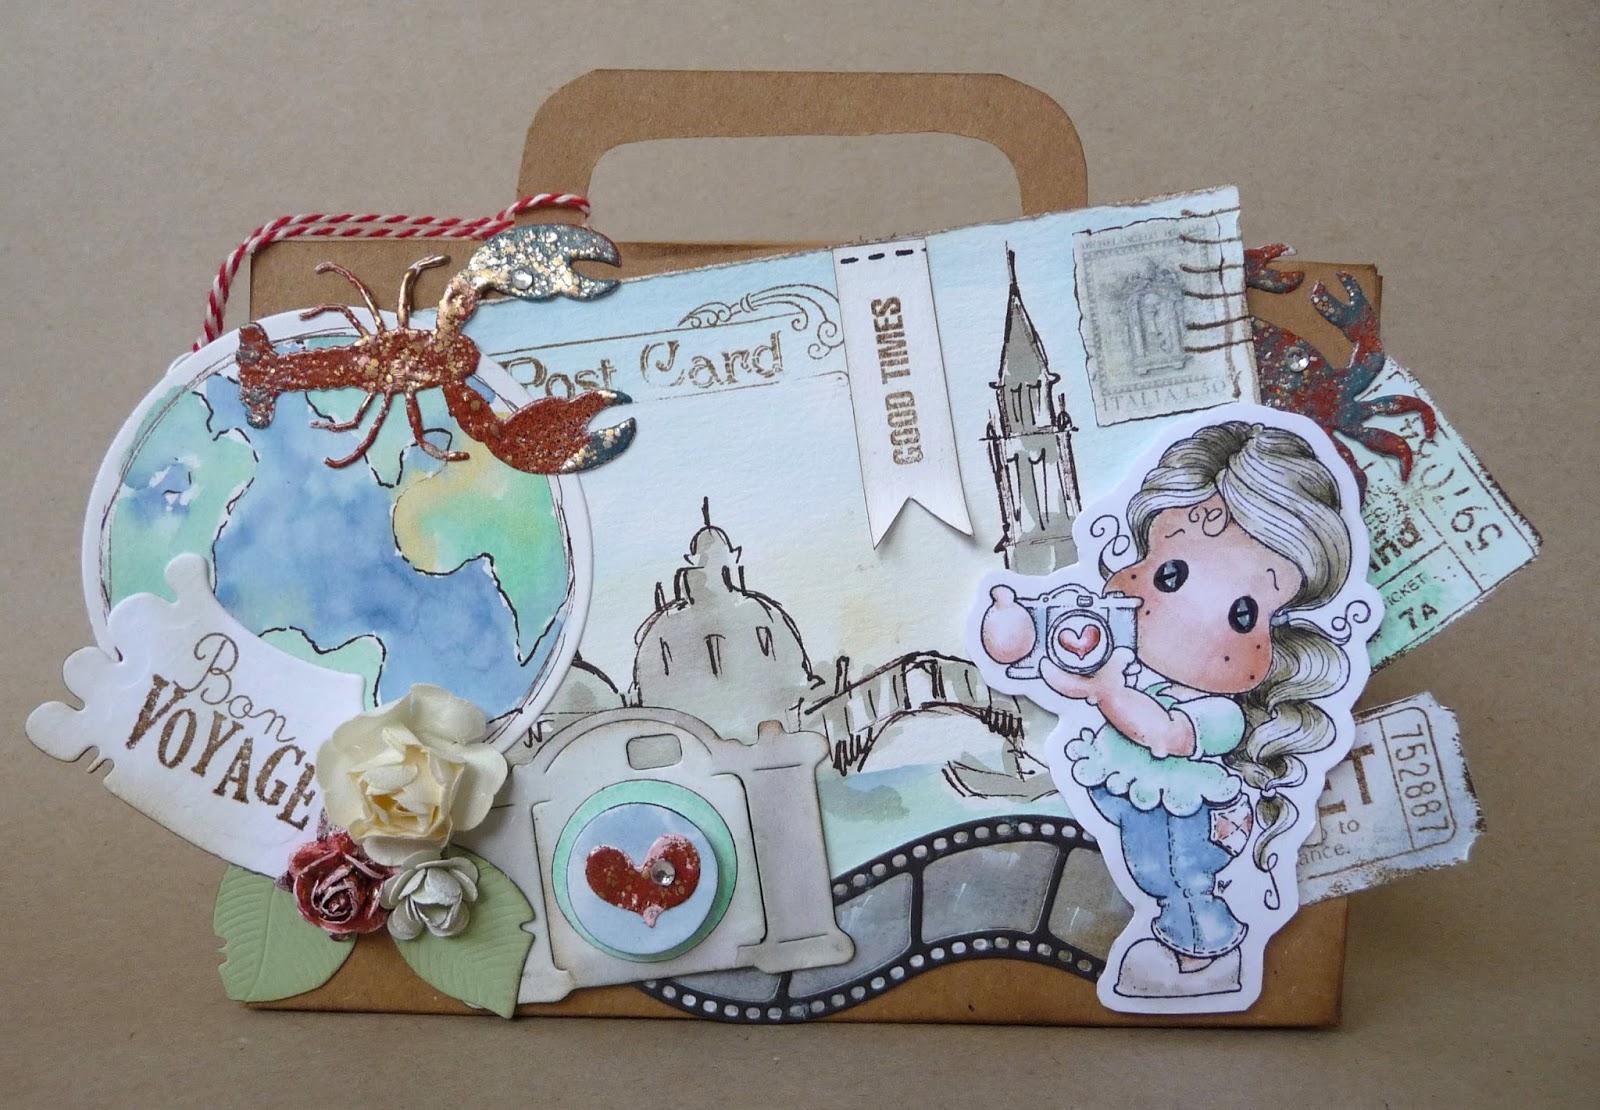 Irenes Hobbywelt Reisekoffer Als Geldgeschenk Mit Insta Tilda